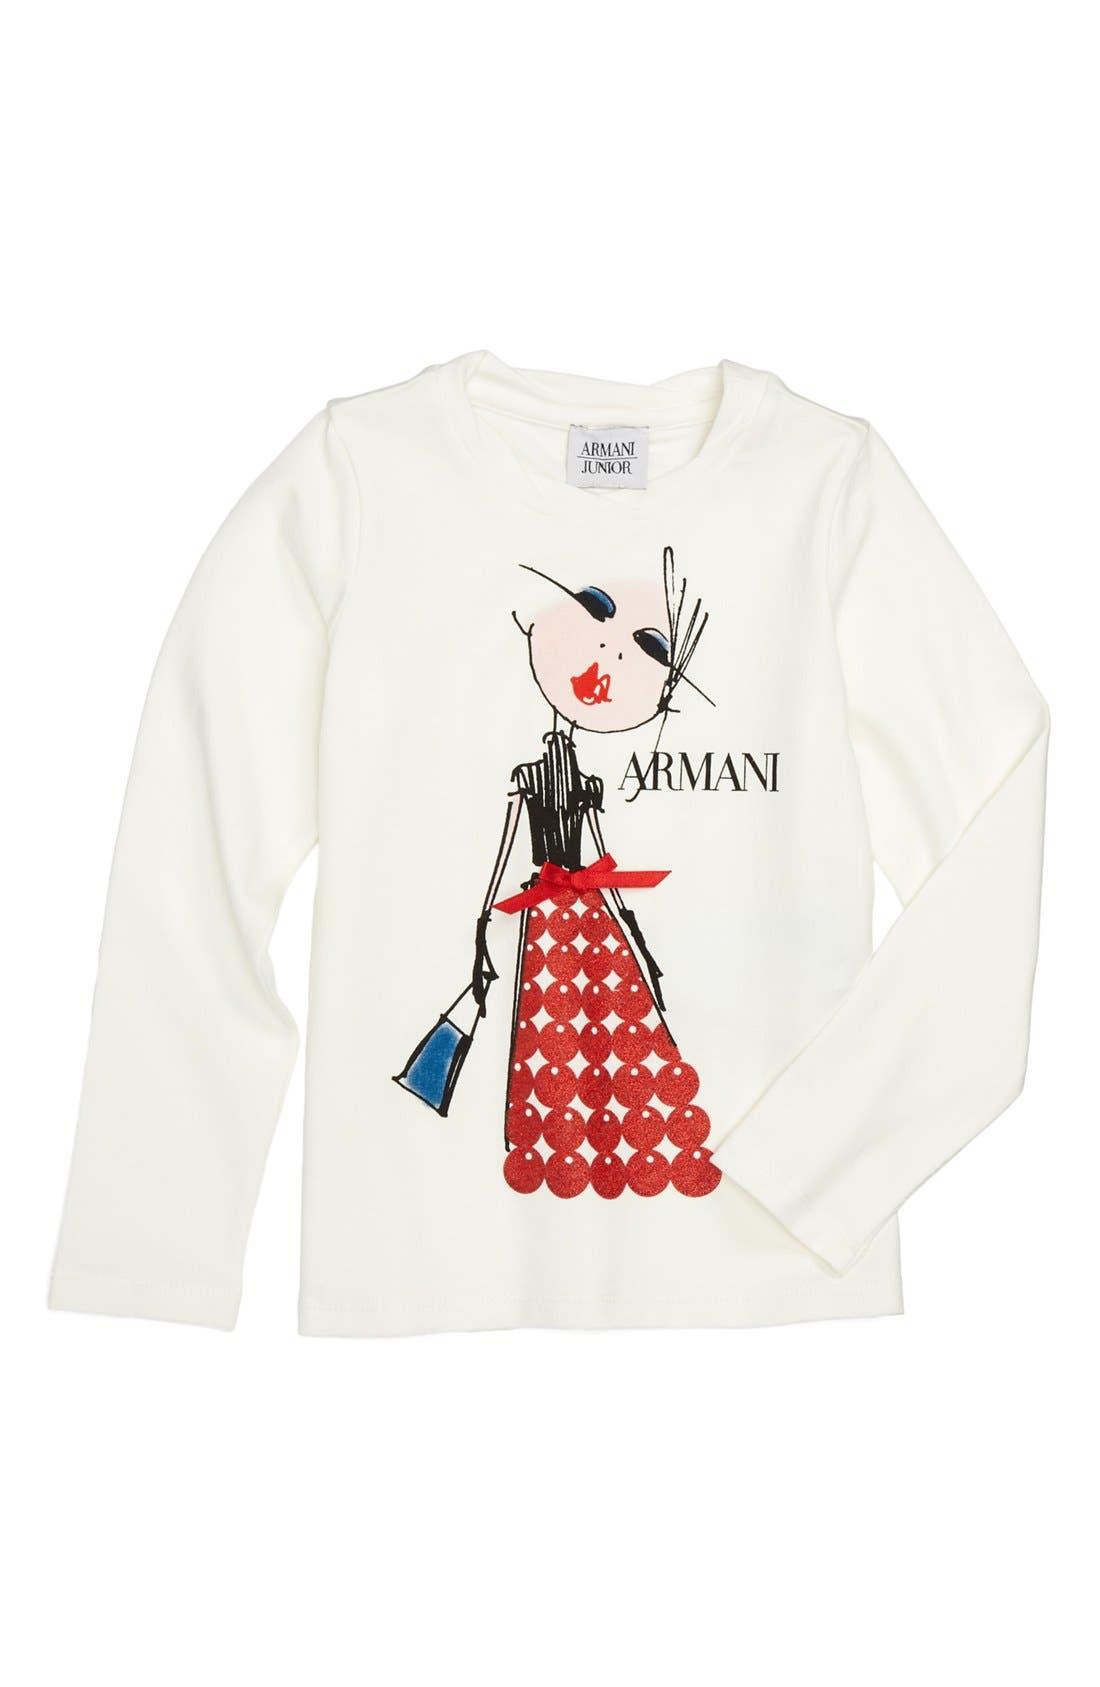 Main Image - Armani Junior 'Armani Girl' Tee (Toddler Girls, Little Girls & Big Girls)